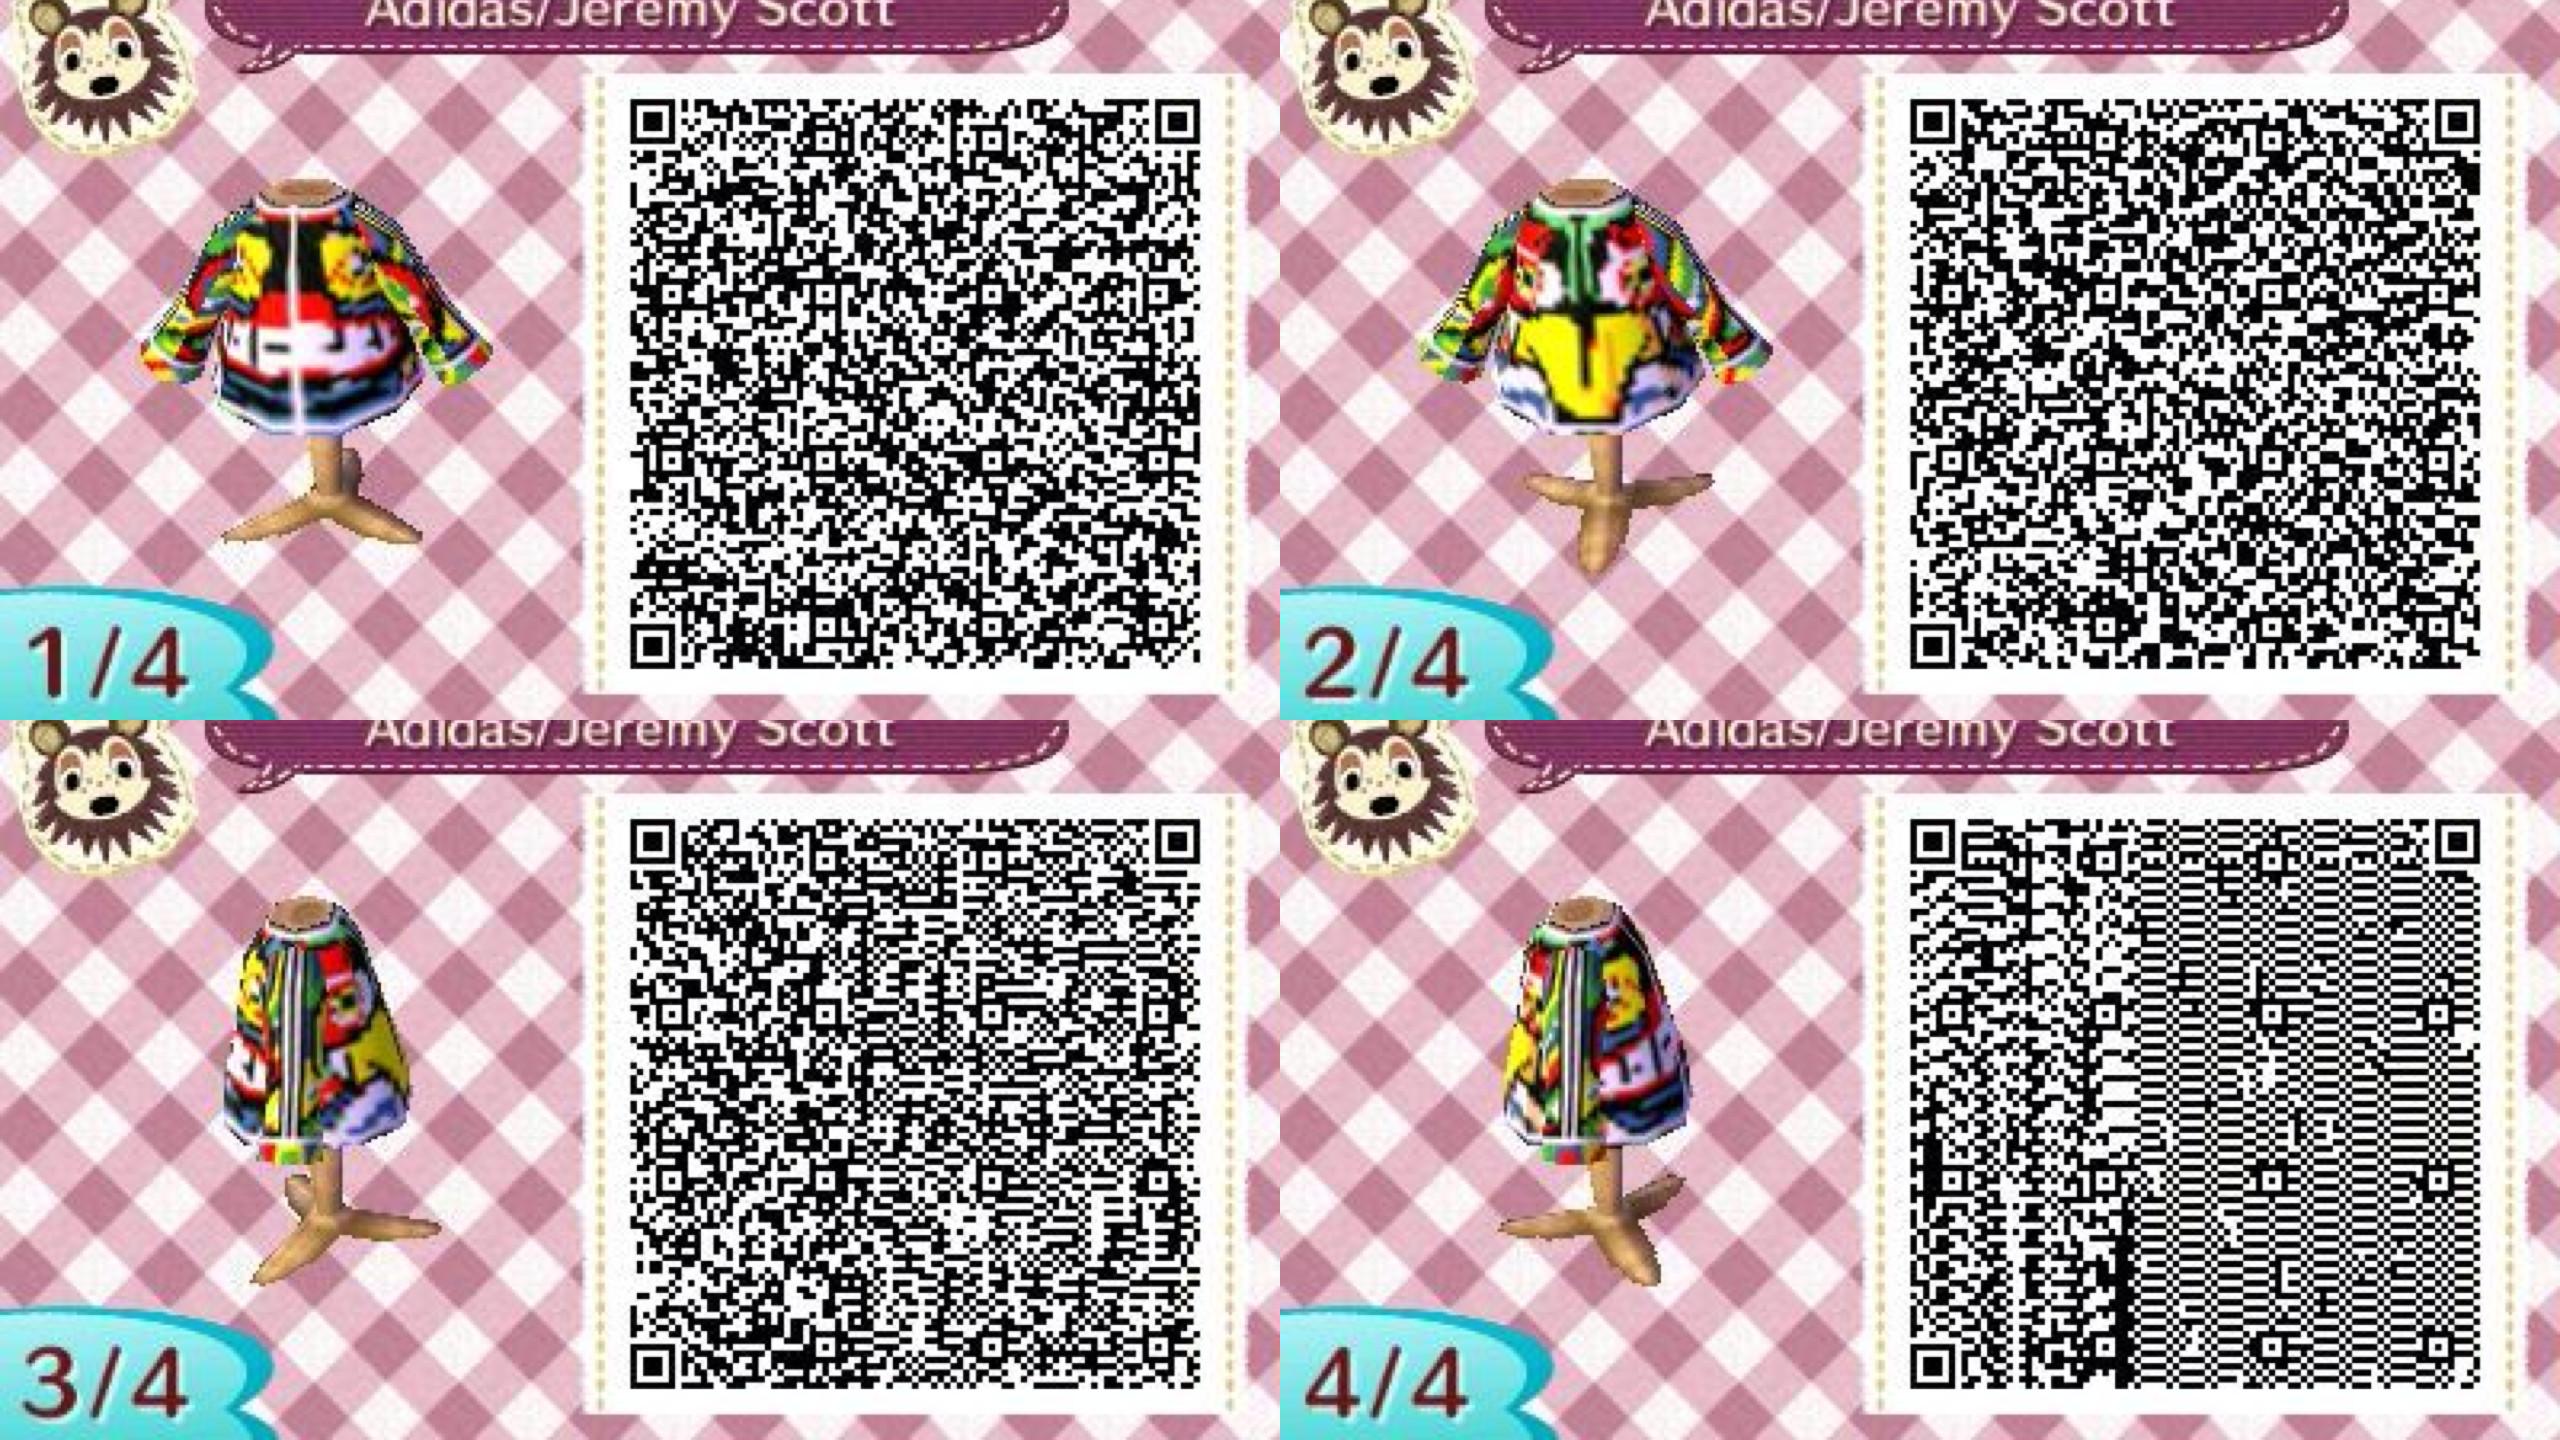 Animal Crossing Qr Codes Wallpaper Acnl Wallpaper Qr 50 Images